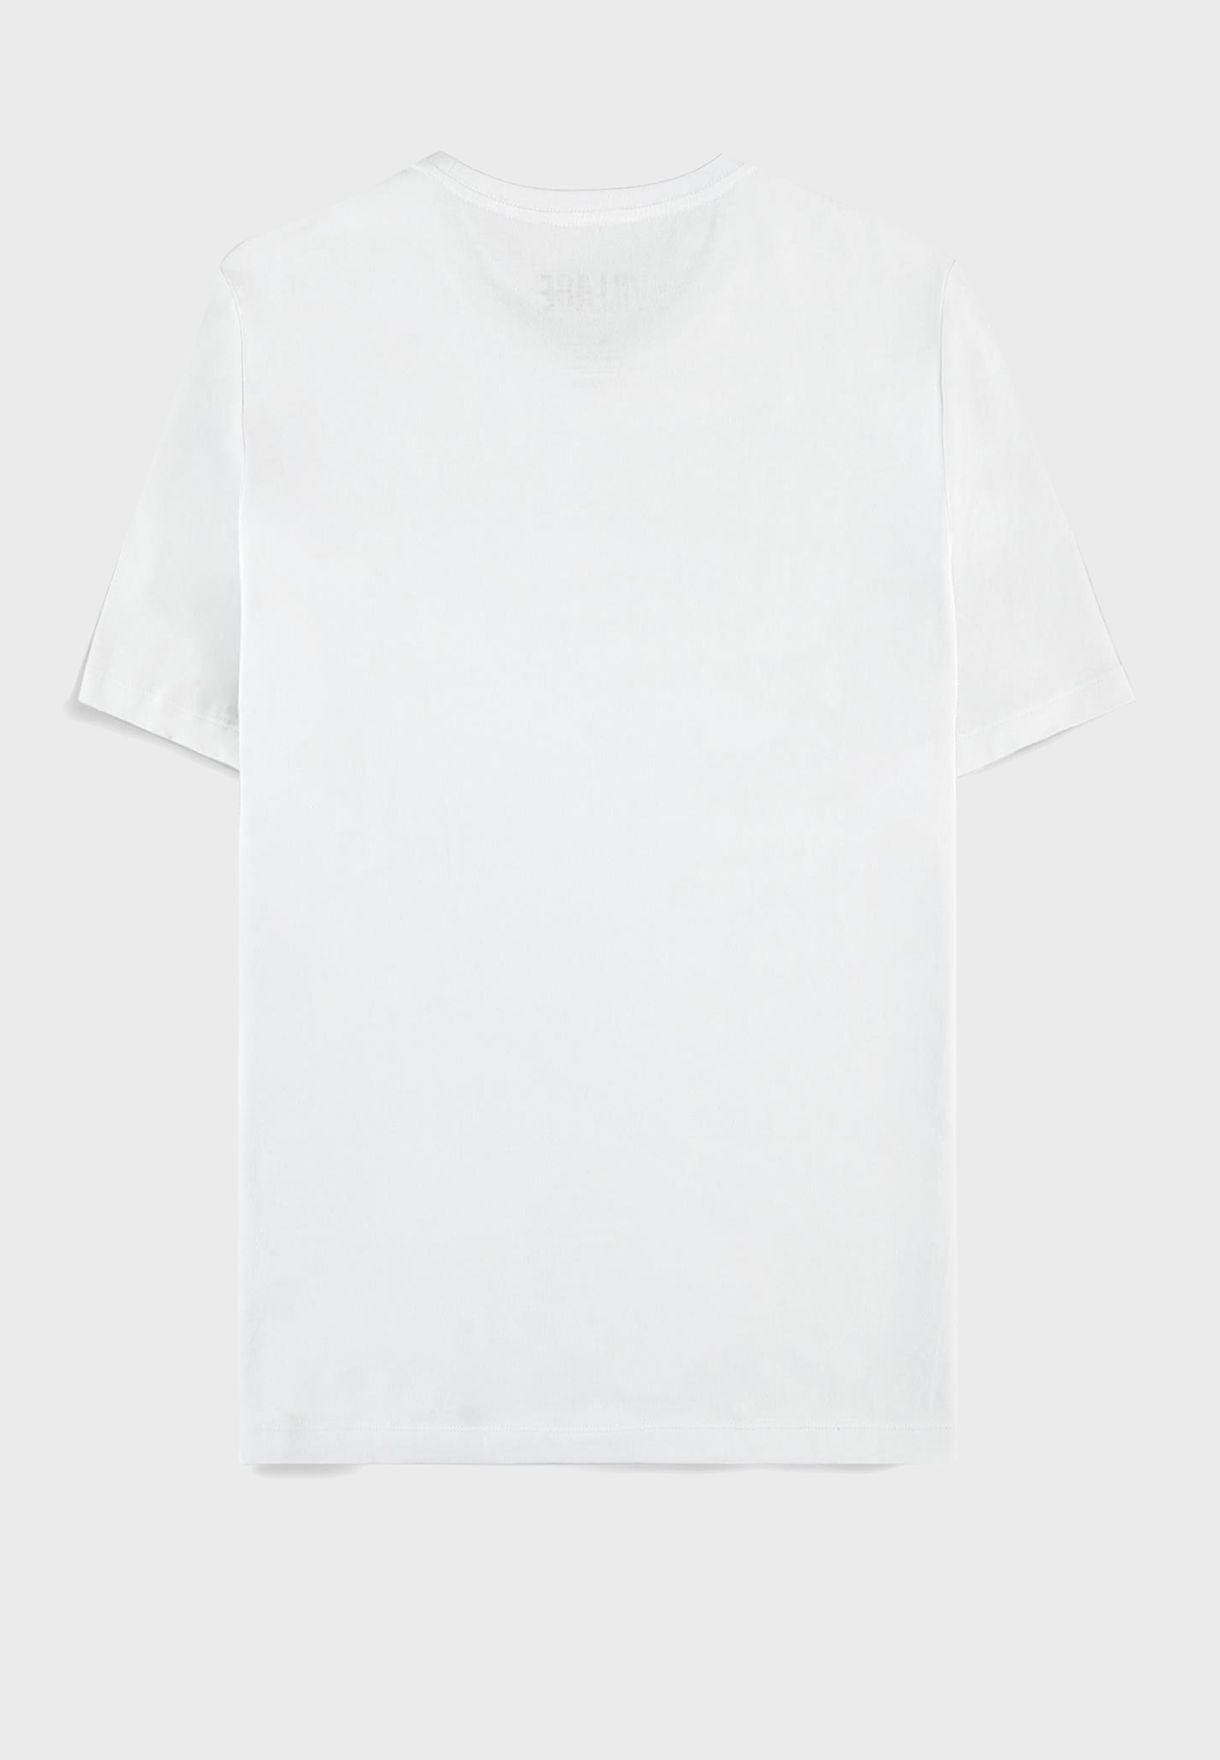 Resident Evil Village Wings Crew Neck T-Shirt